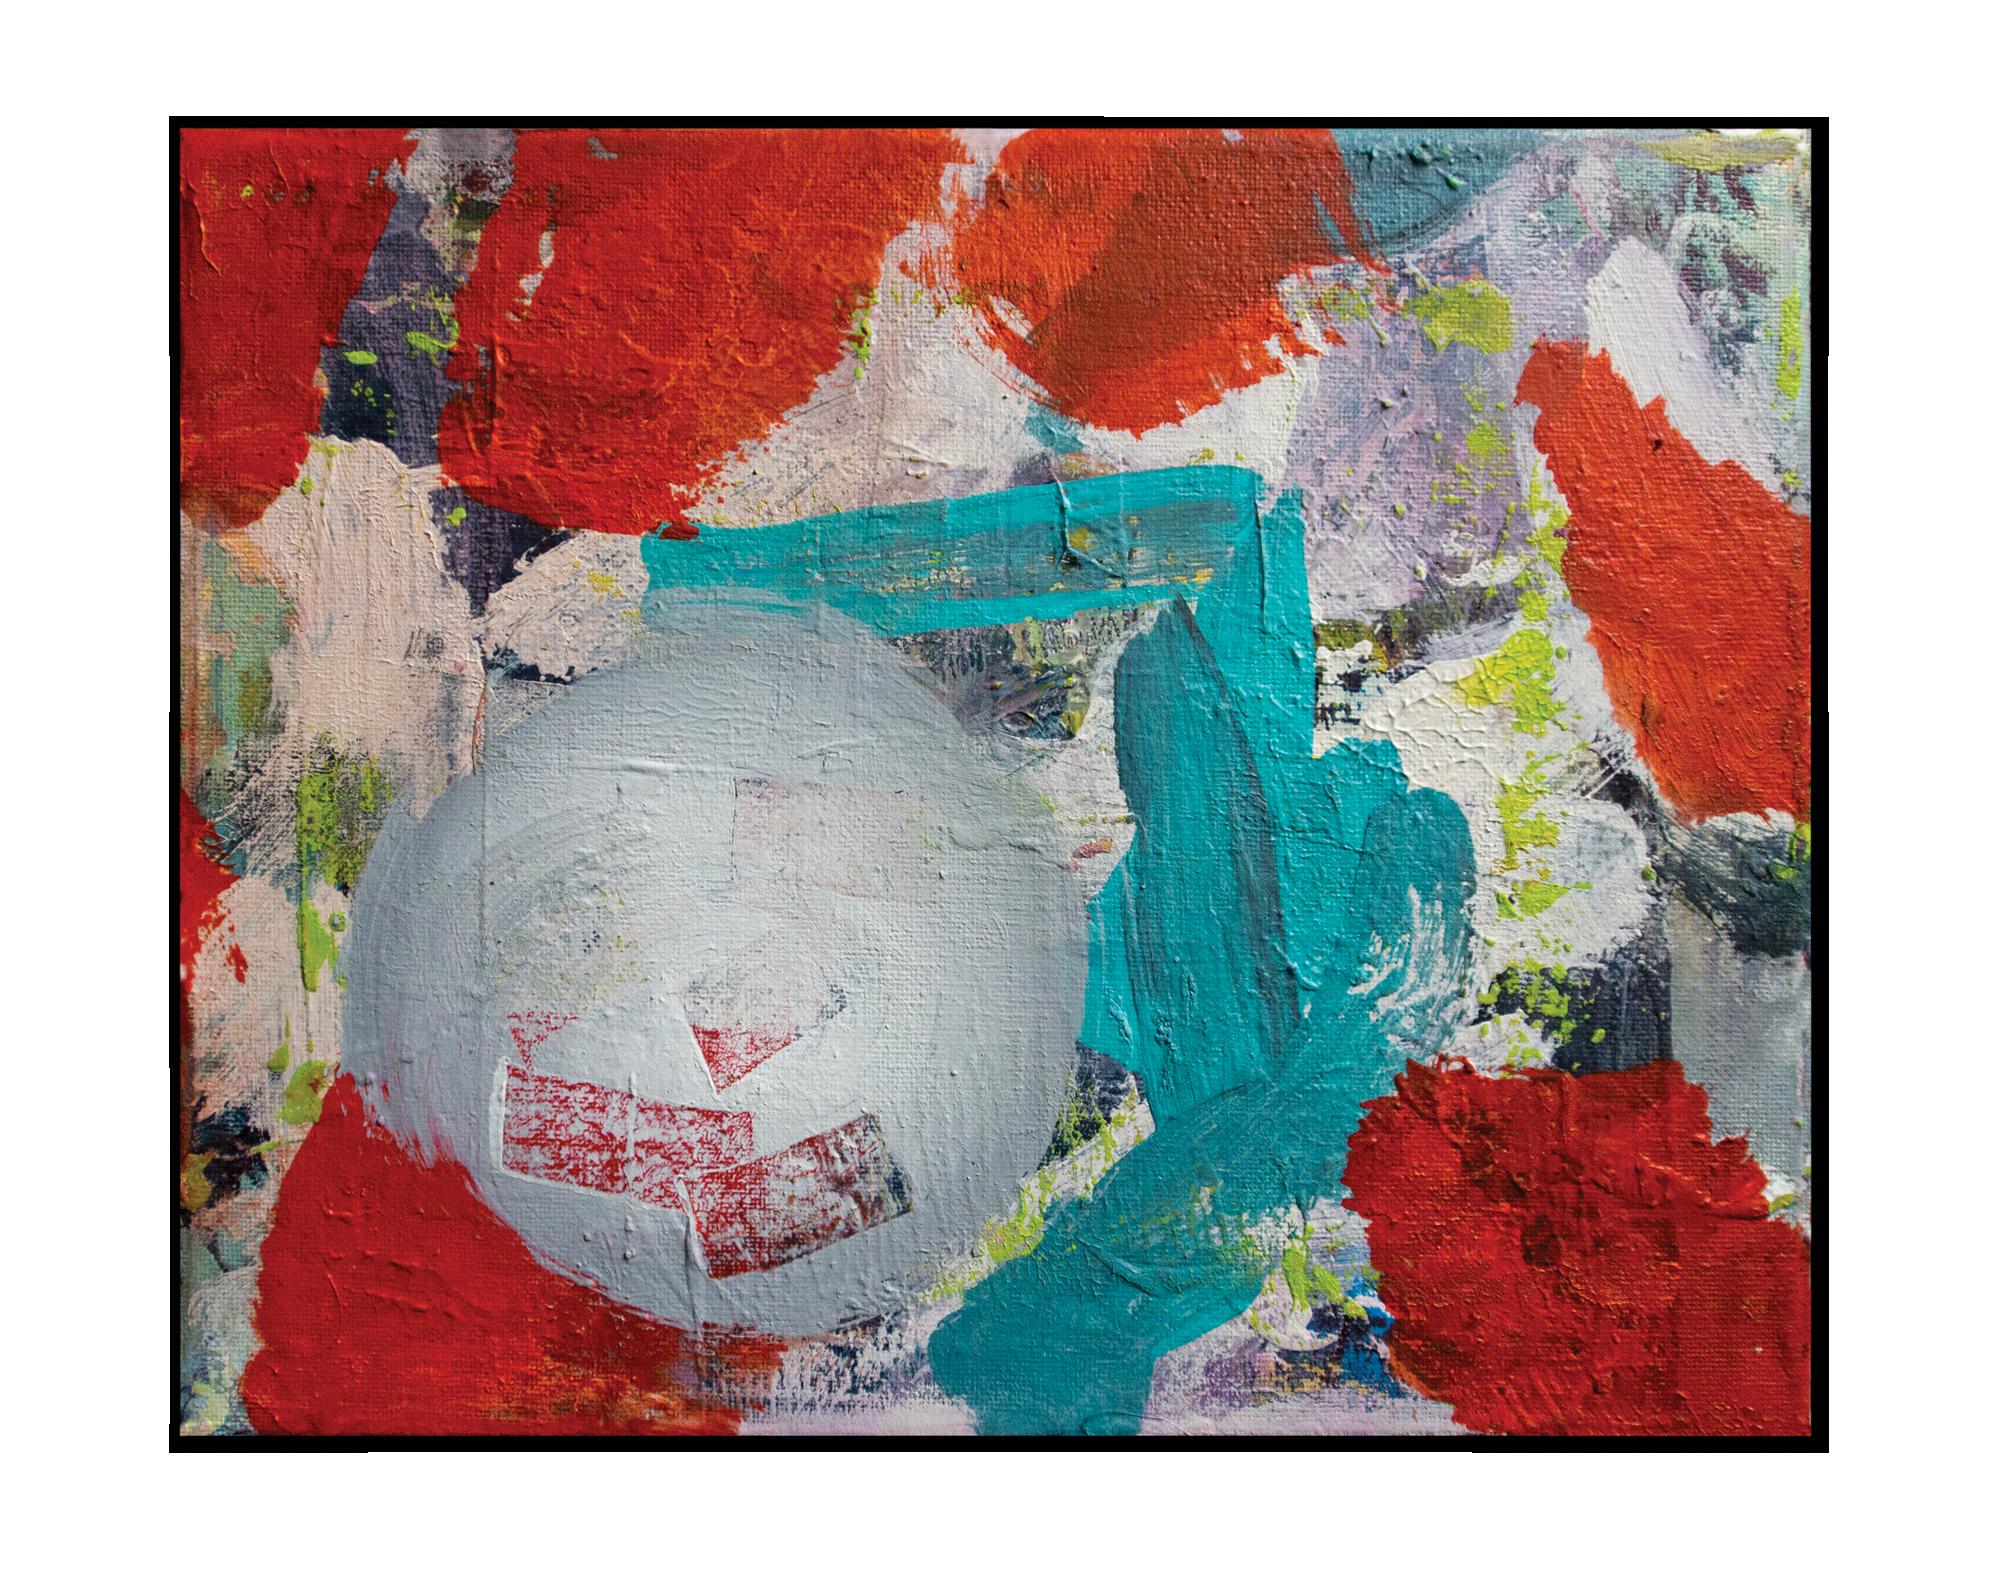 Points rouges © Prosper Jerominus, 2015